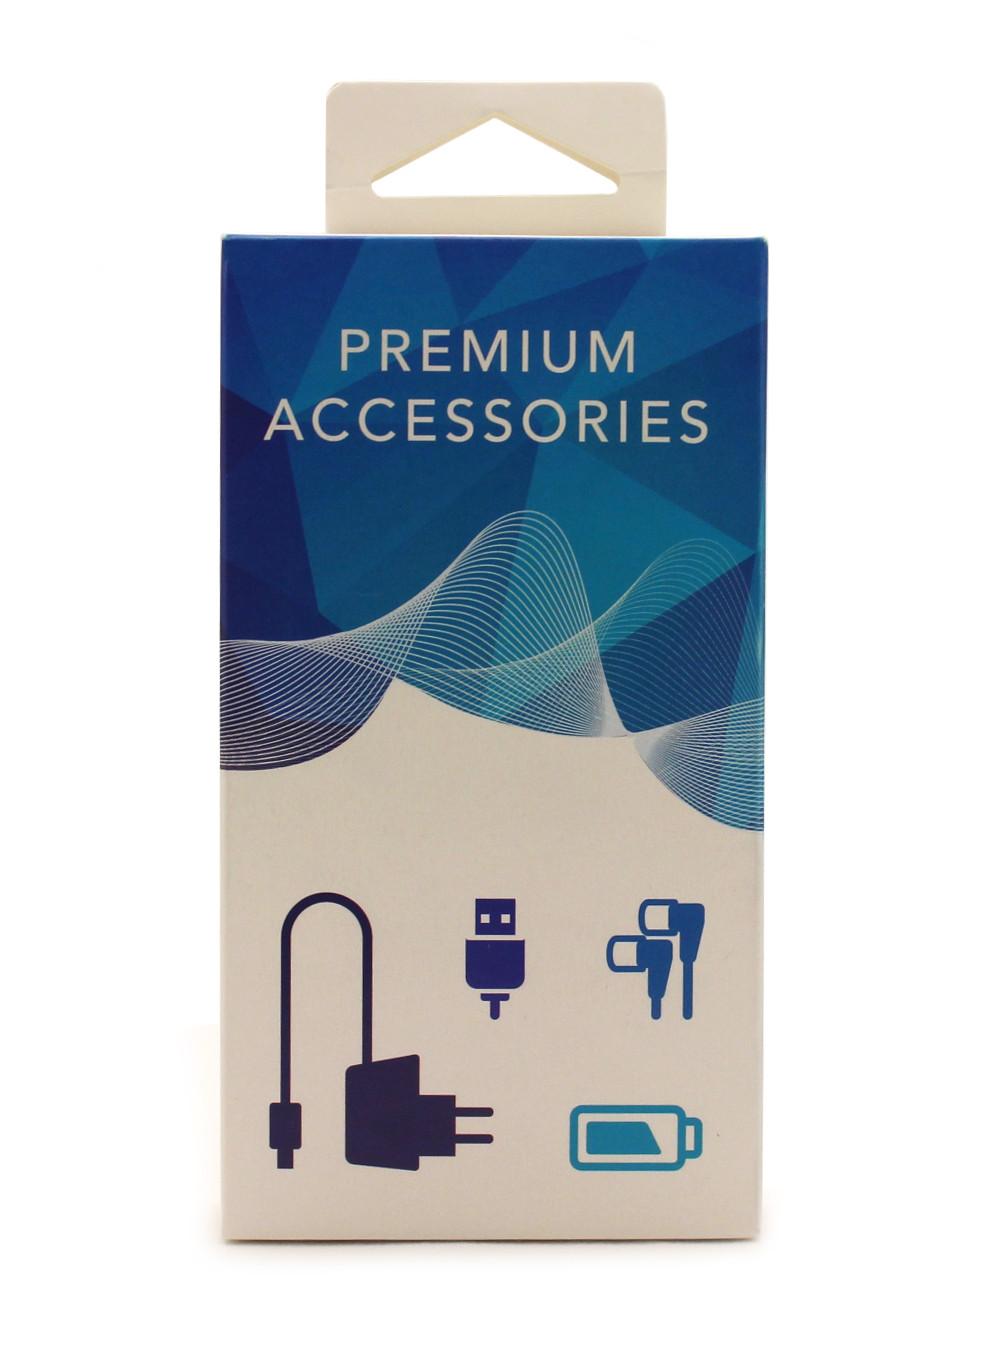 Dėžutė Premium accessories didelė 70x130x30mm